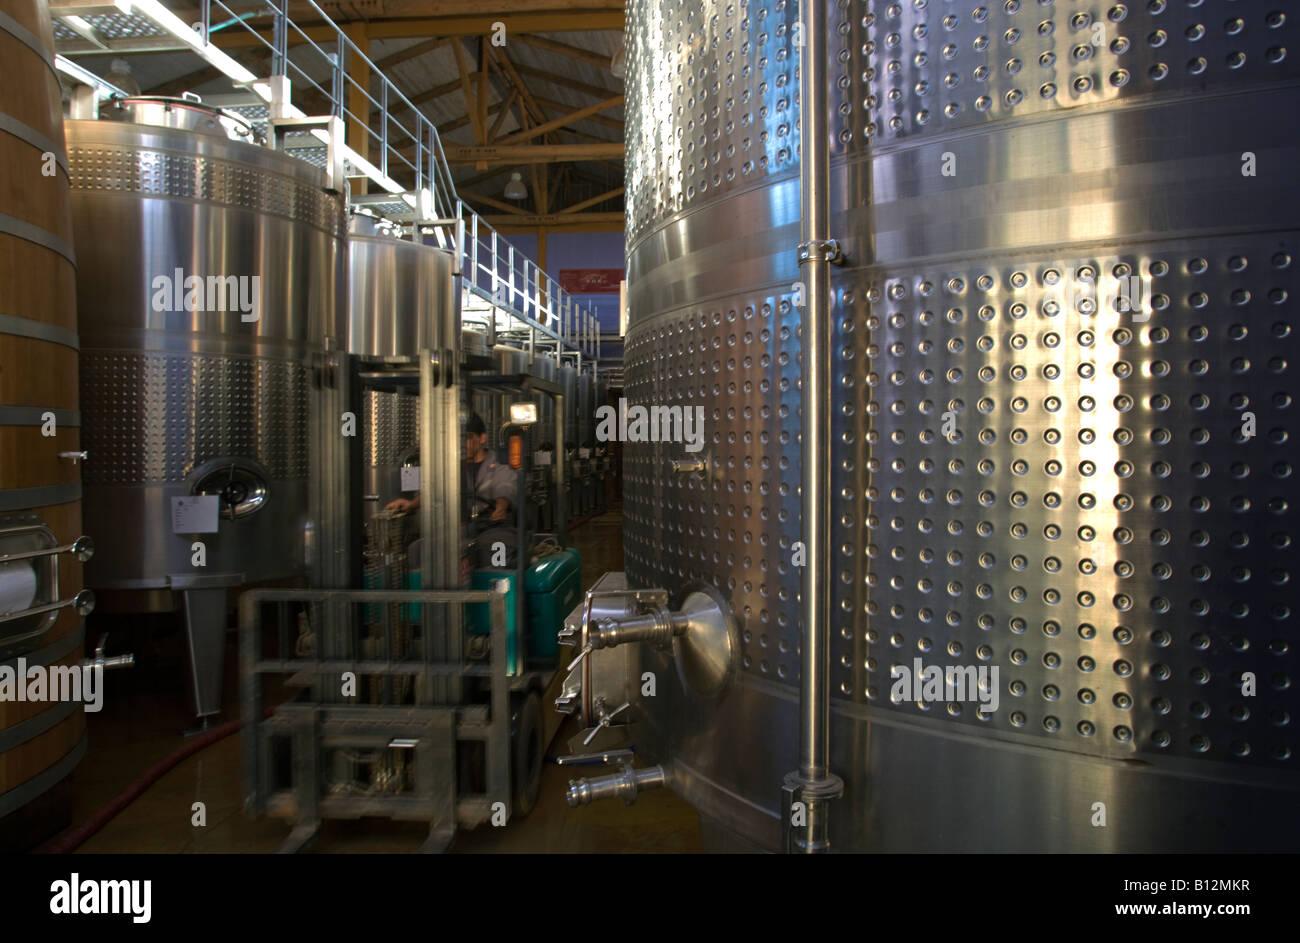 STAINLESS STEEL STORAGE TANKS VINA SANTA CRUZ WINERY COLCHAGUA CHILE